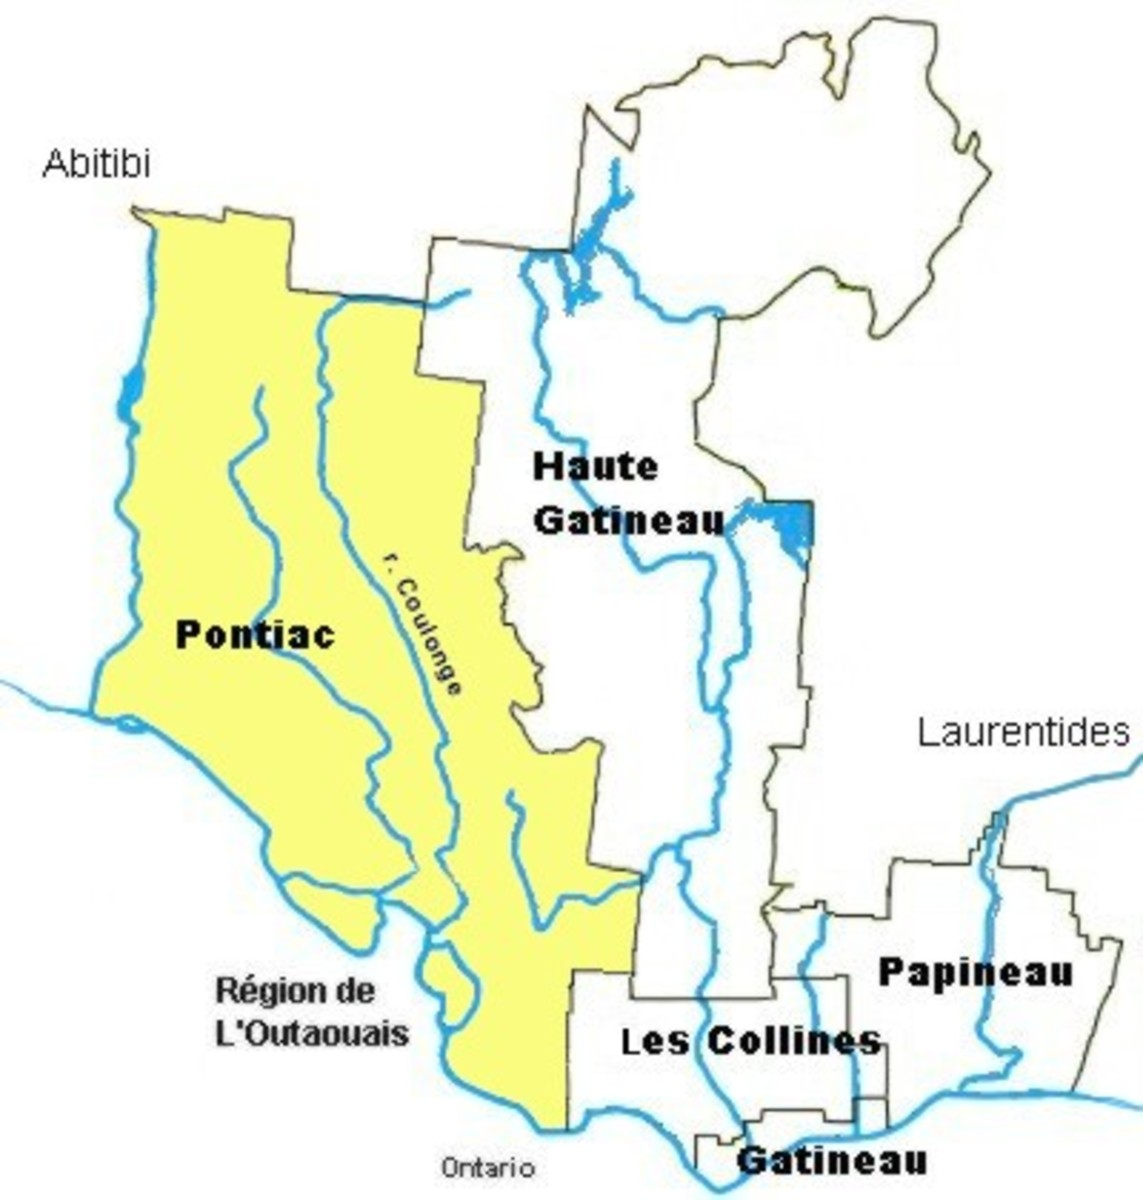 Map location of Municipalité régionale de comté de Pontiac / Pontiac Regional County Municipality